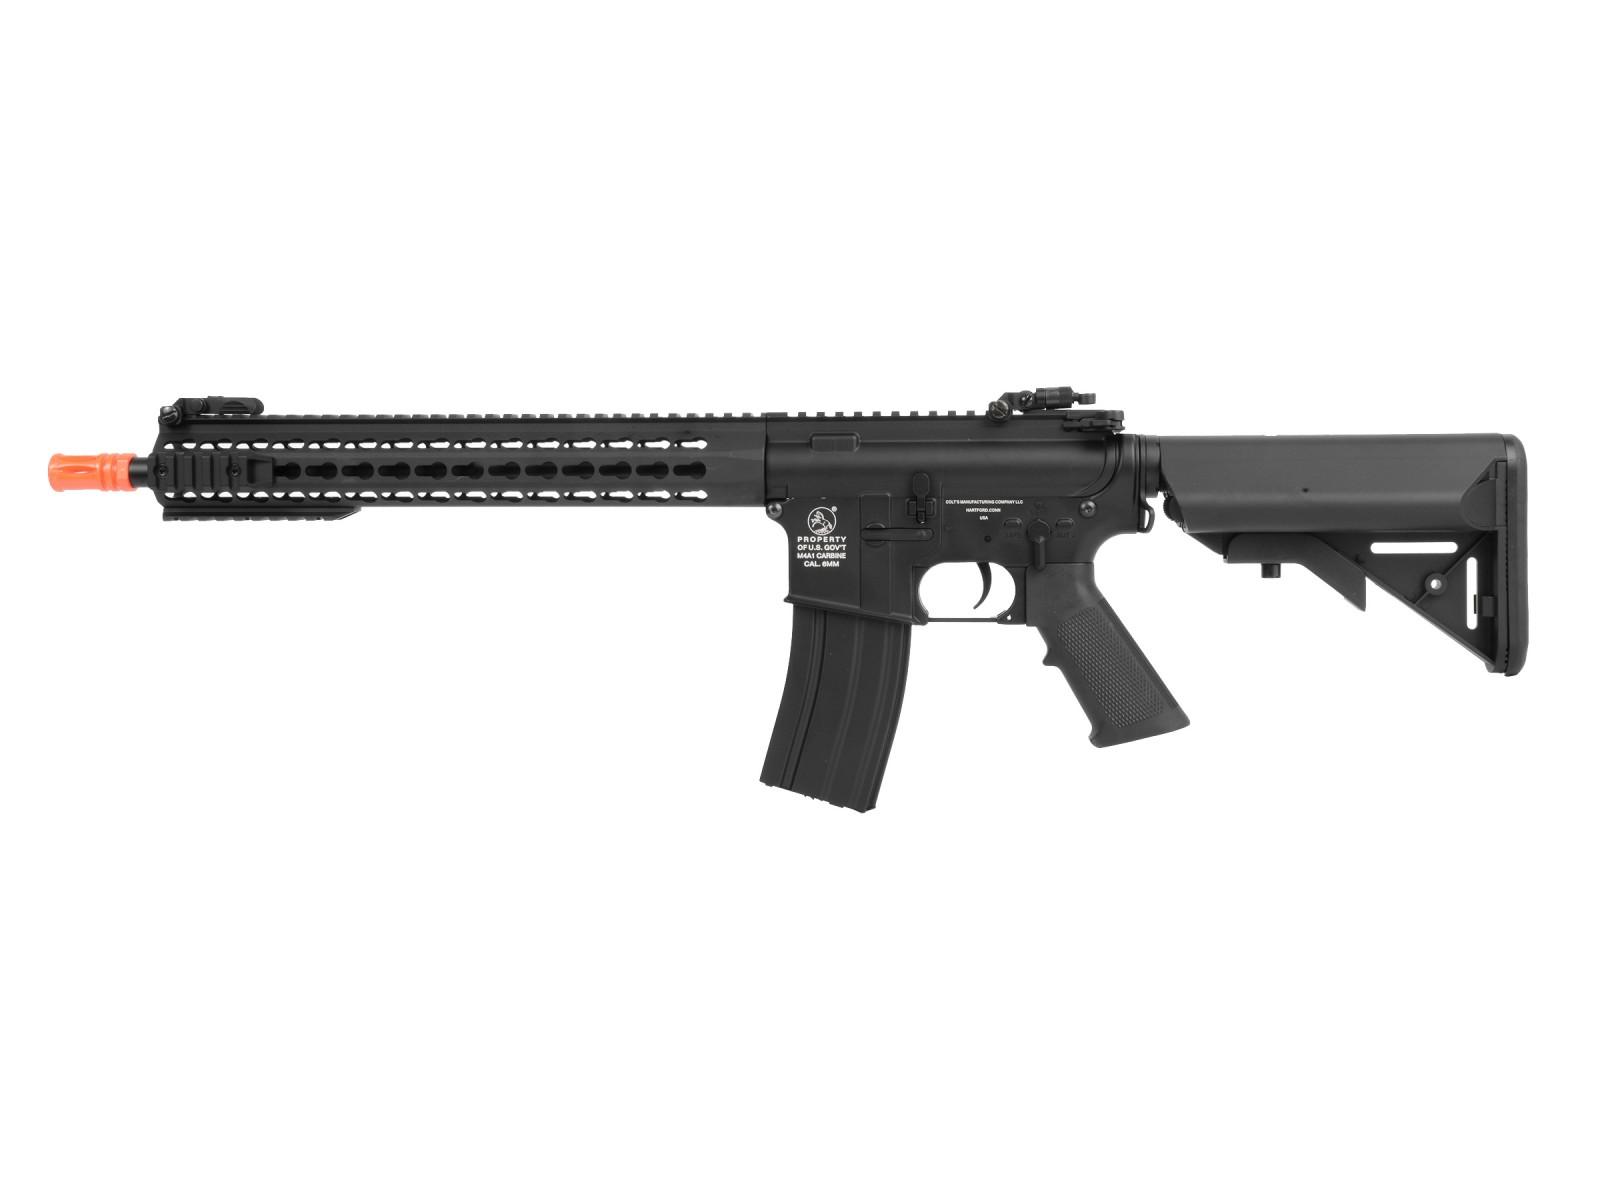 Colt_M4A1_Long_Keymod_Full_Metal_AEG_Rifle_Black_6mm